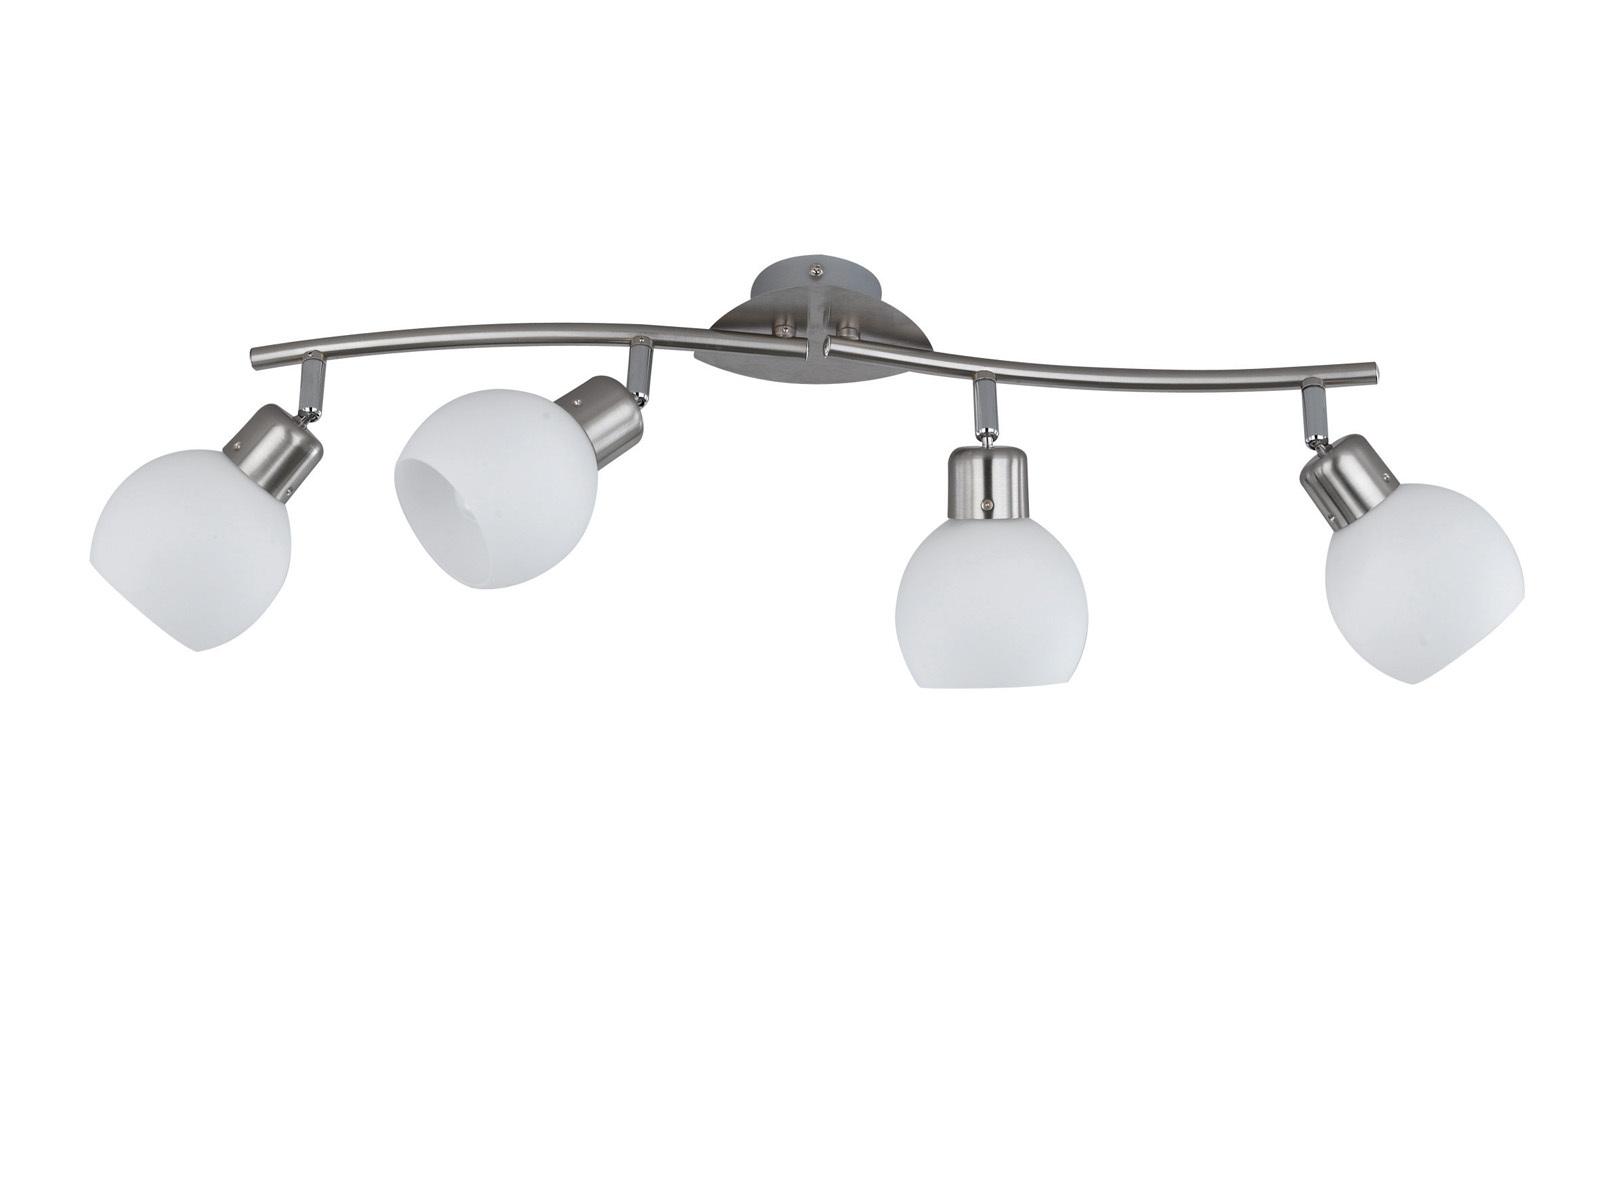 ca inkl 2 x 4 W LEDs Trio LED-Deckenstrahler 30 cm Rostfarben